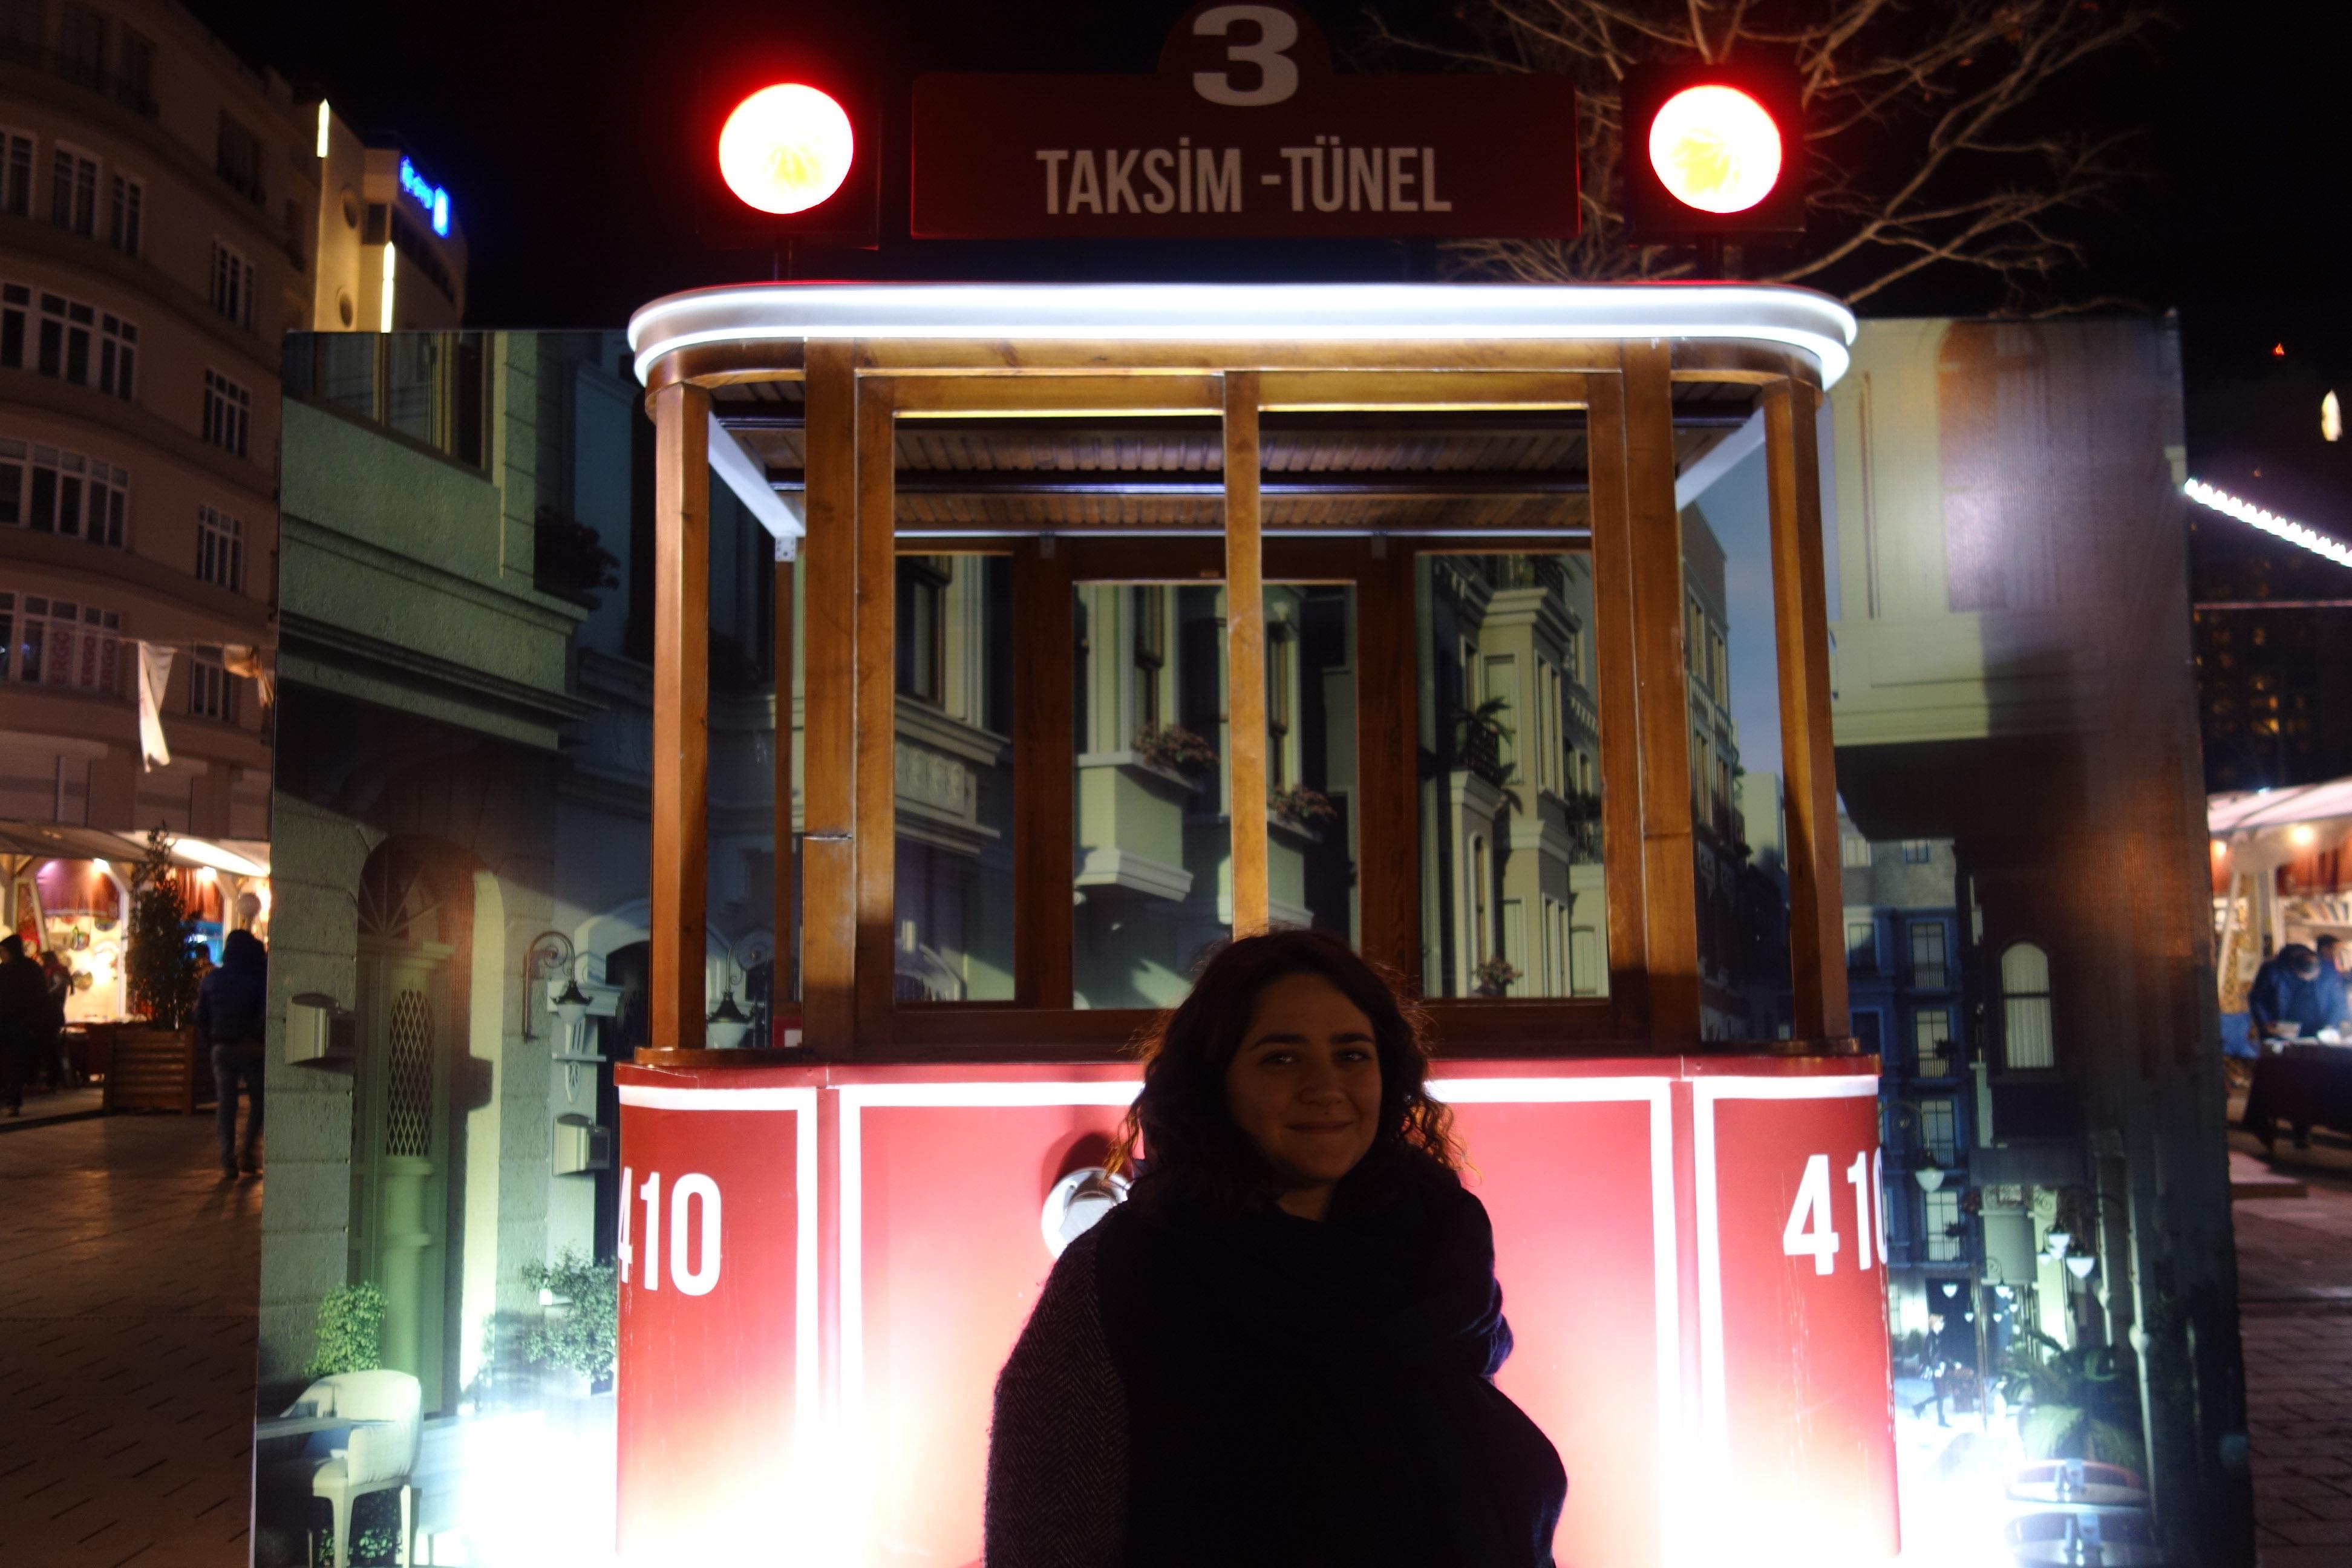 Il tram nostalgico a Piazza Taksim